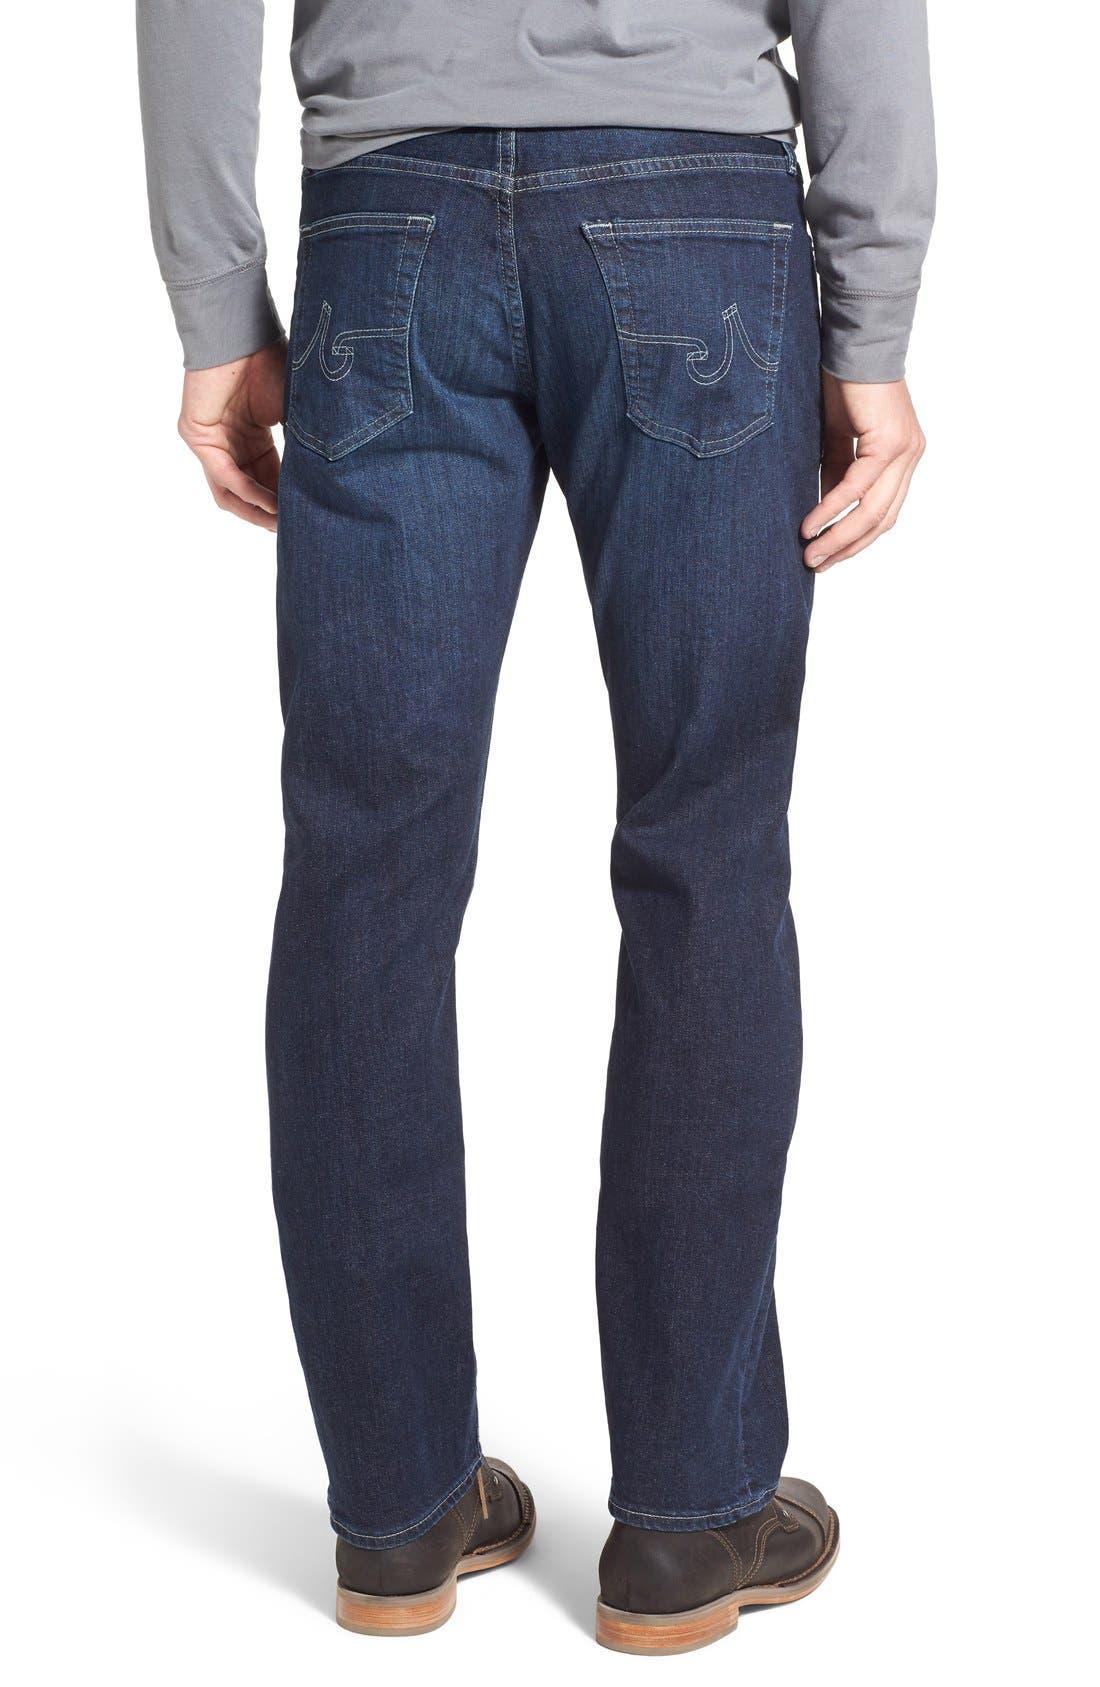 'Protégé' Straight Leg Jeans,                             Alternate thumbnail 4, color,                             402